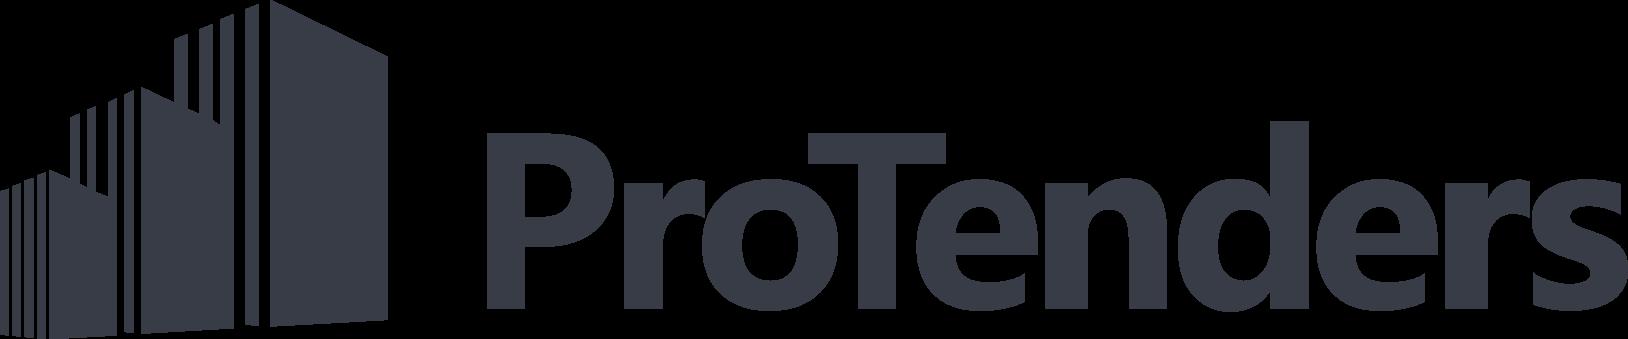 Protenders Logo.png